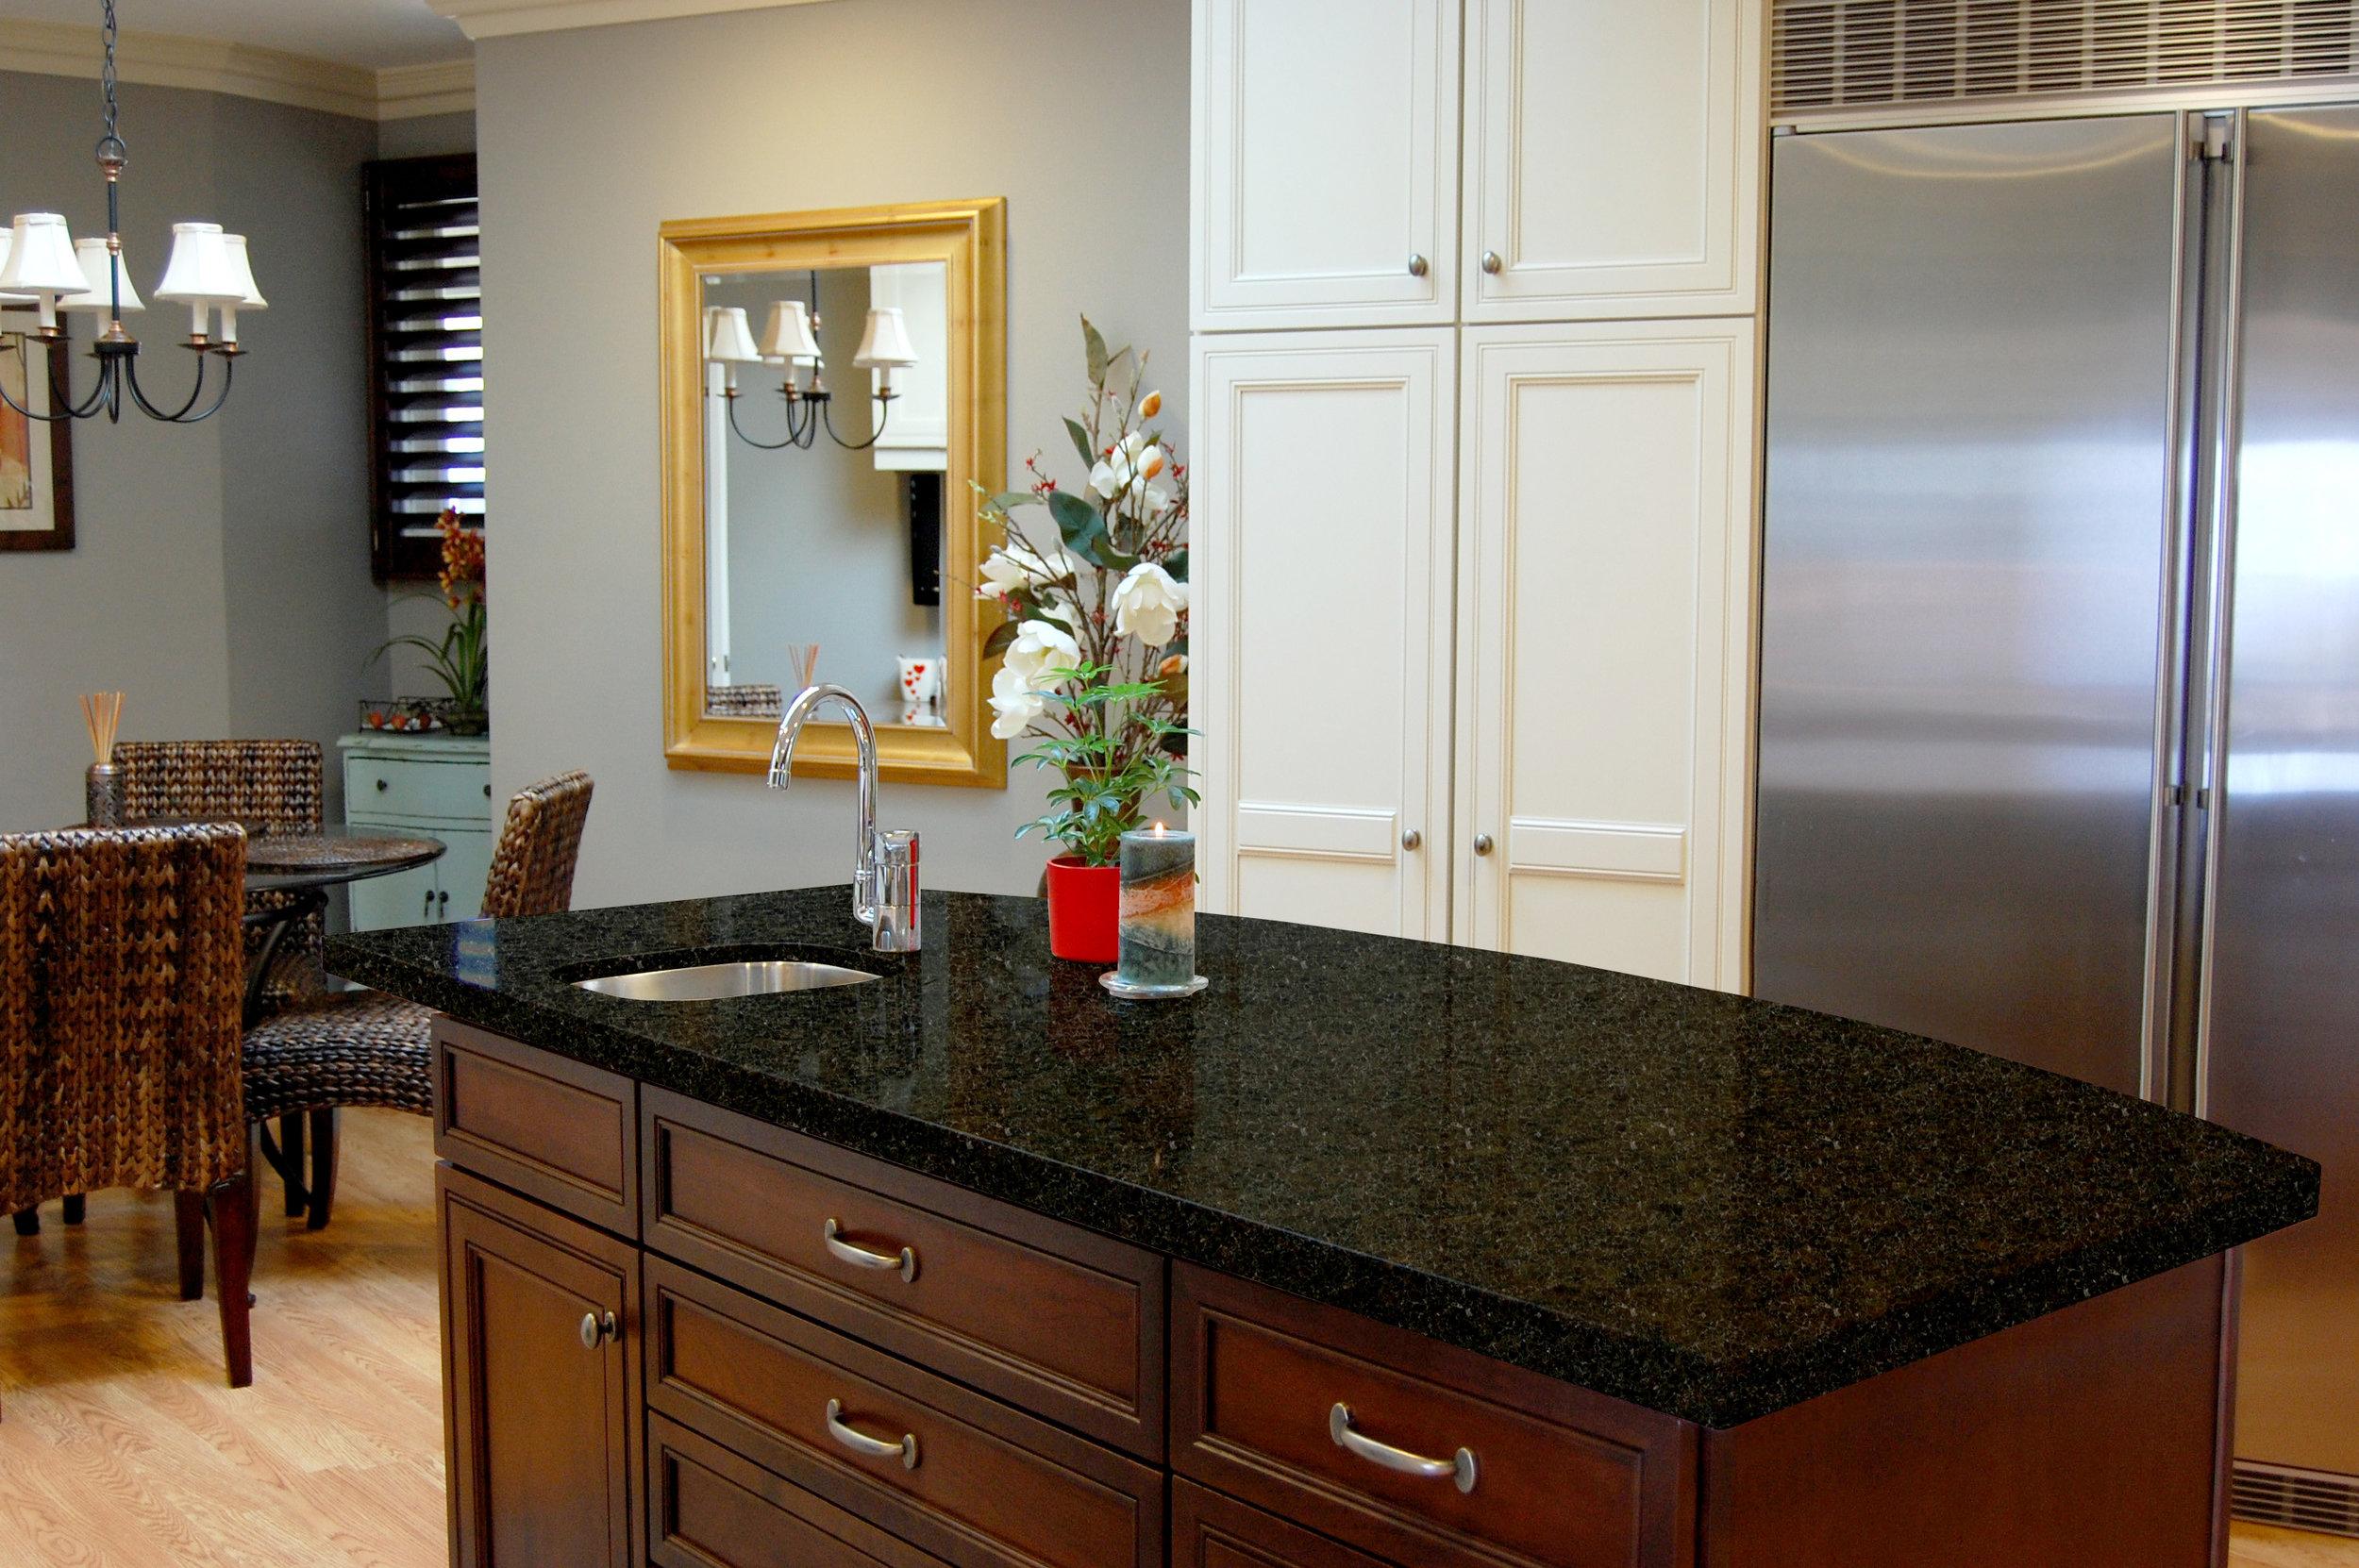 Luxury Multi-Unit: Island Countertop